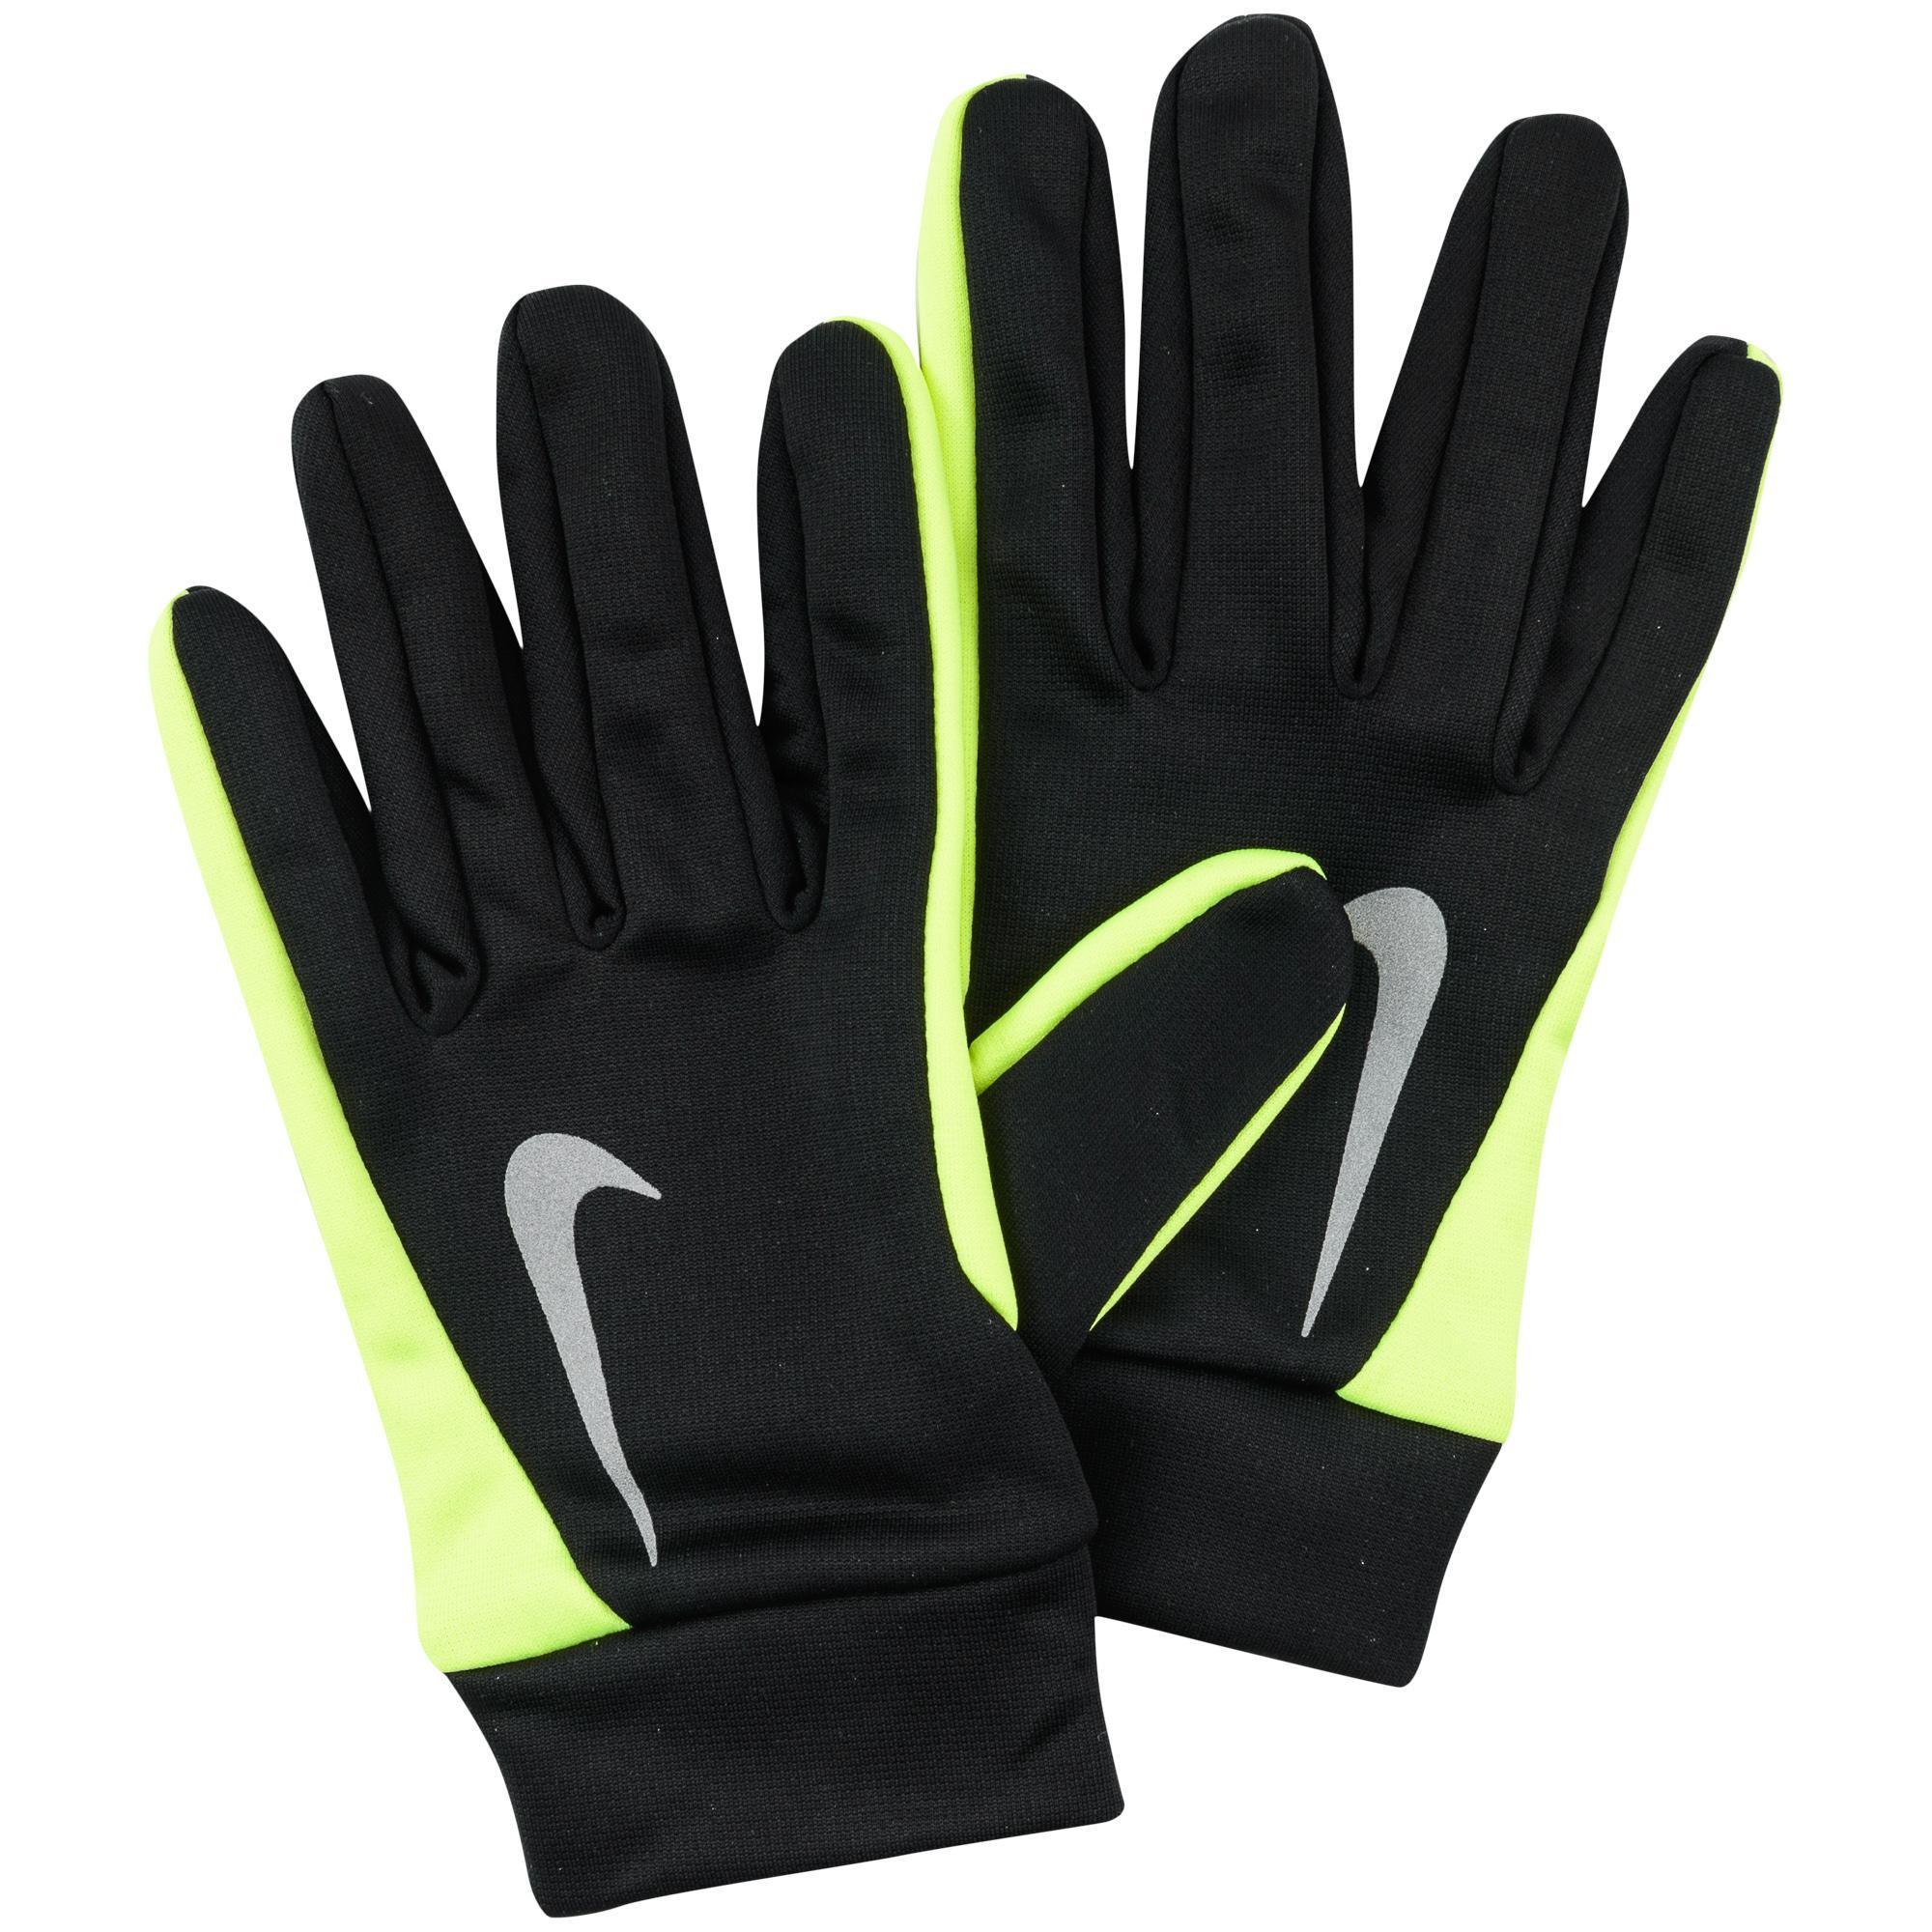 Nike Spelarhandskar Hyperwarm Svart/Neon